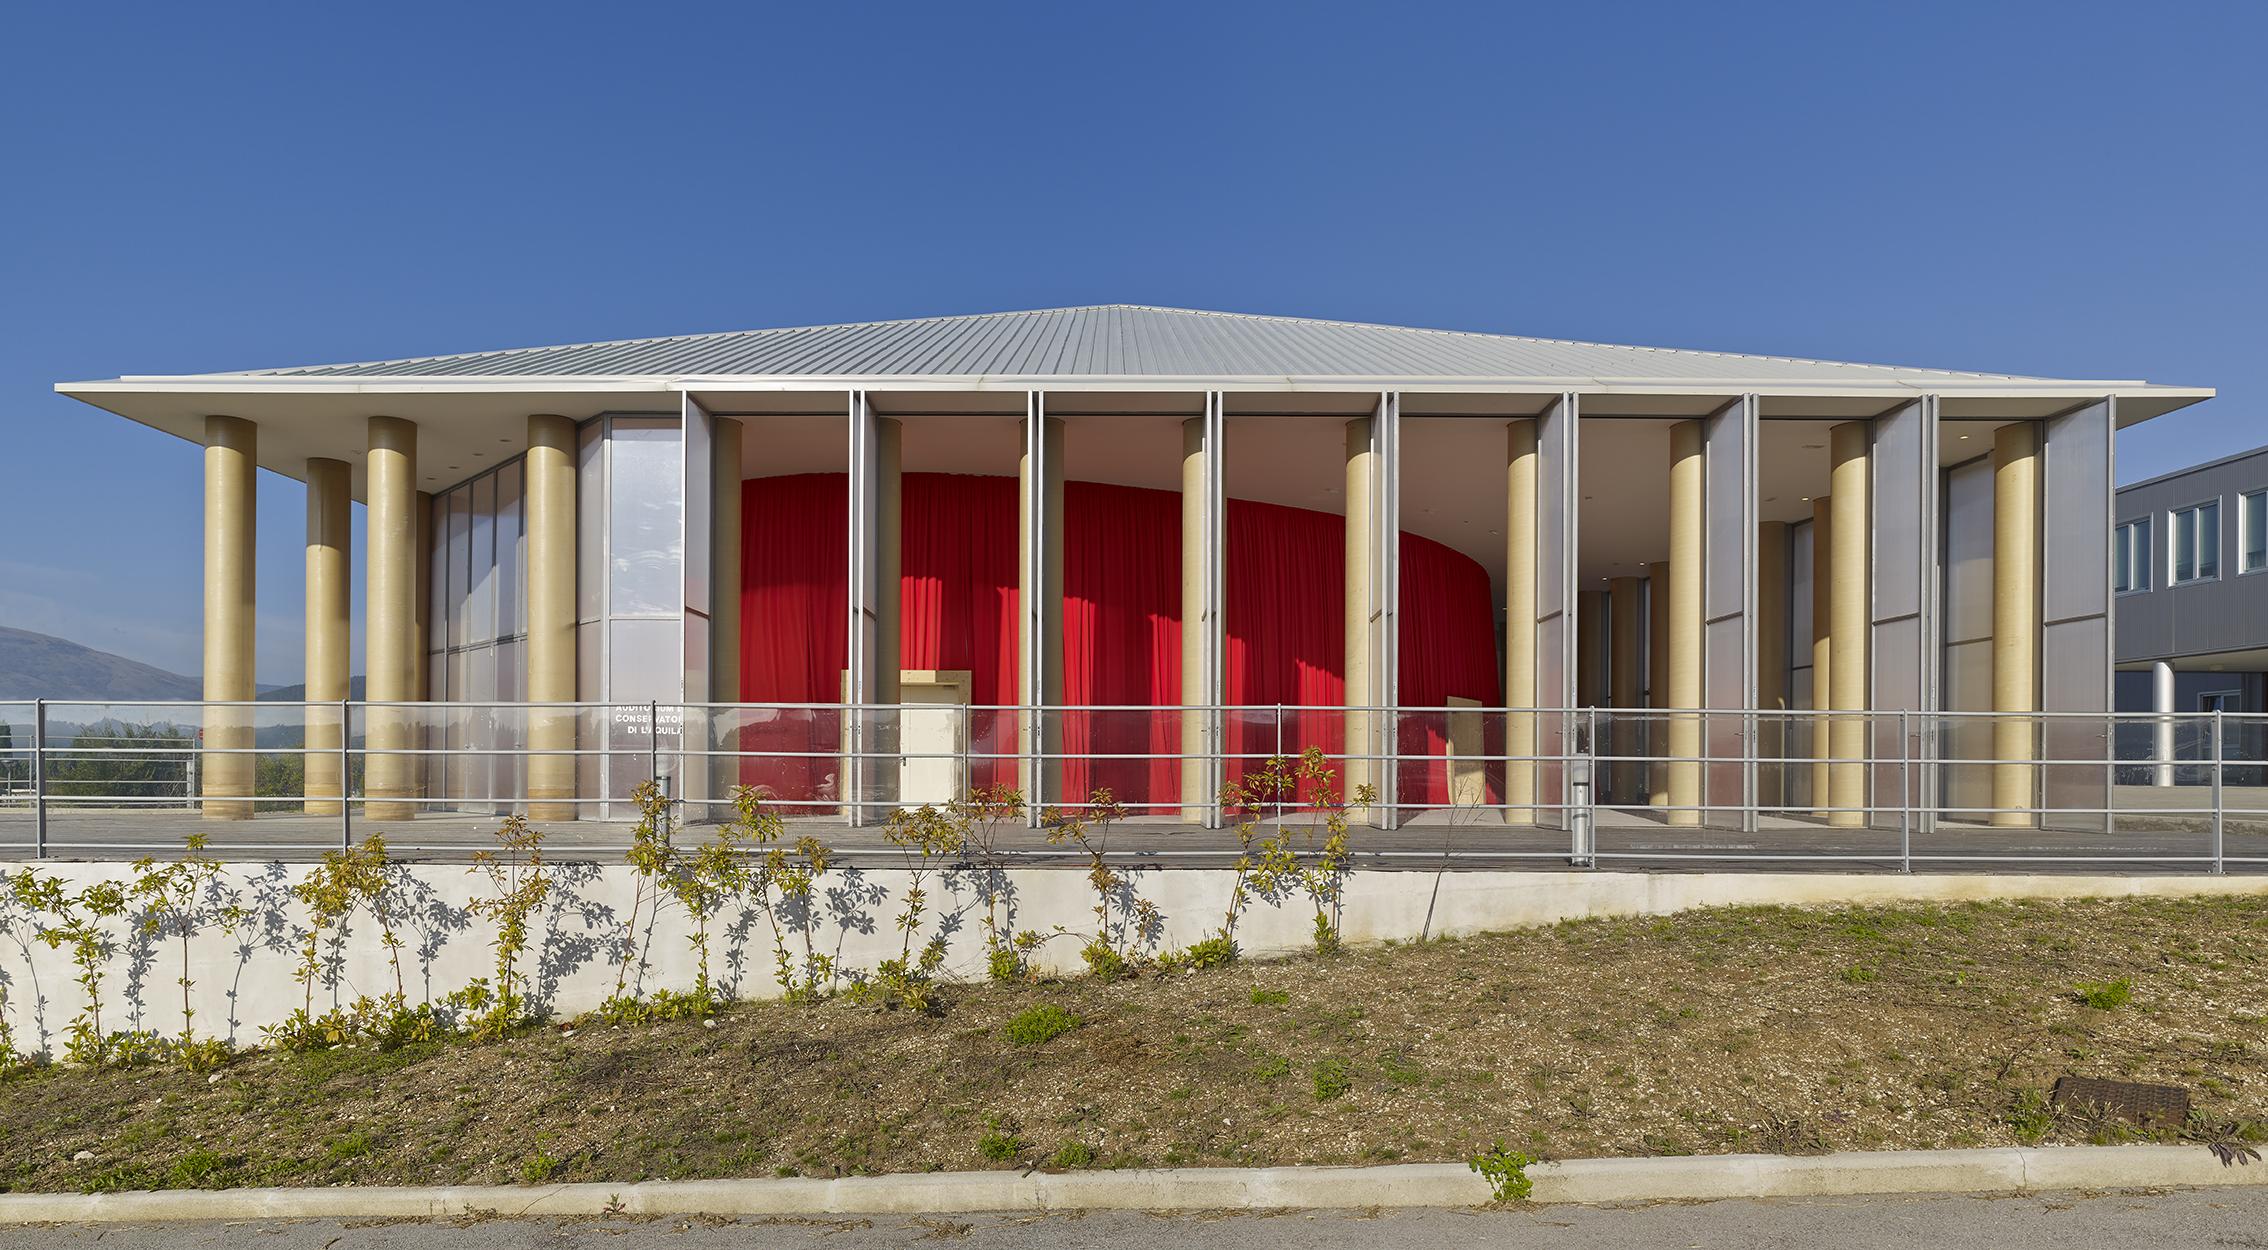 Paper Concert Hall, 2011, L'Aquila, Italy. fot. Didier Boy de la Tour